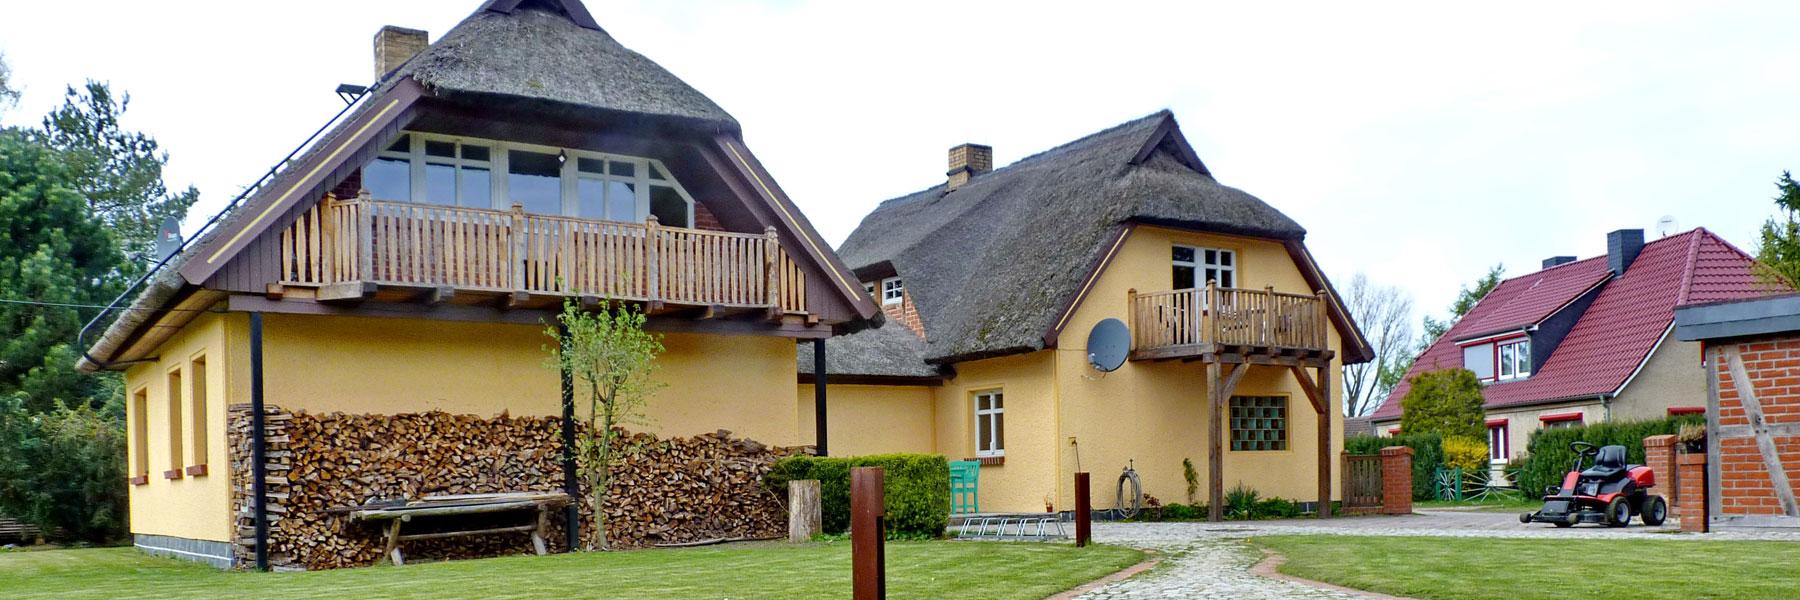 Außenansicht Pension - Eis-Café Schumann & Pension